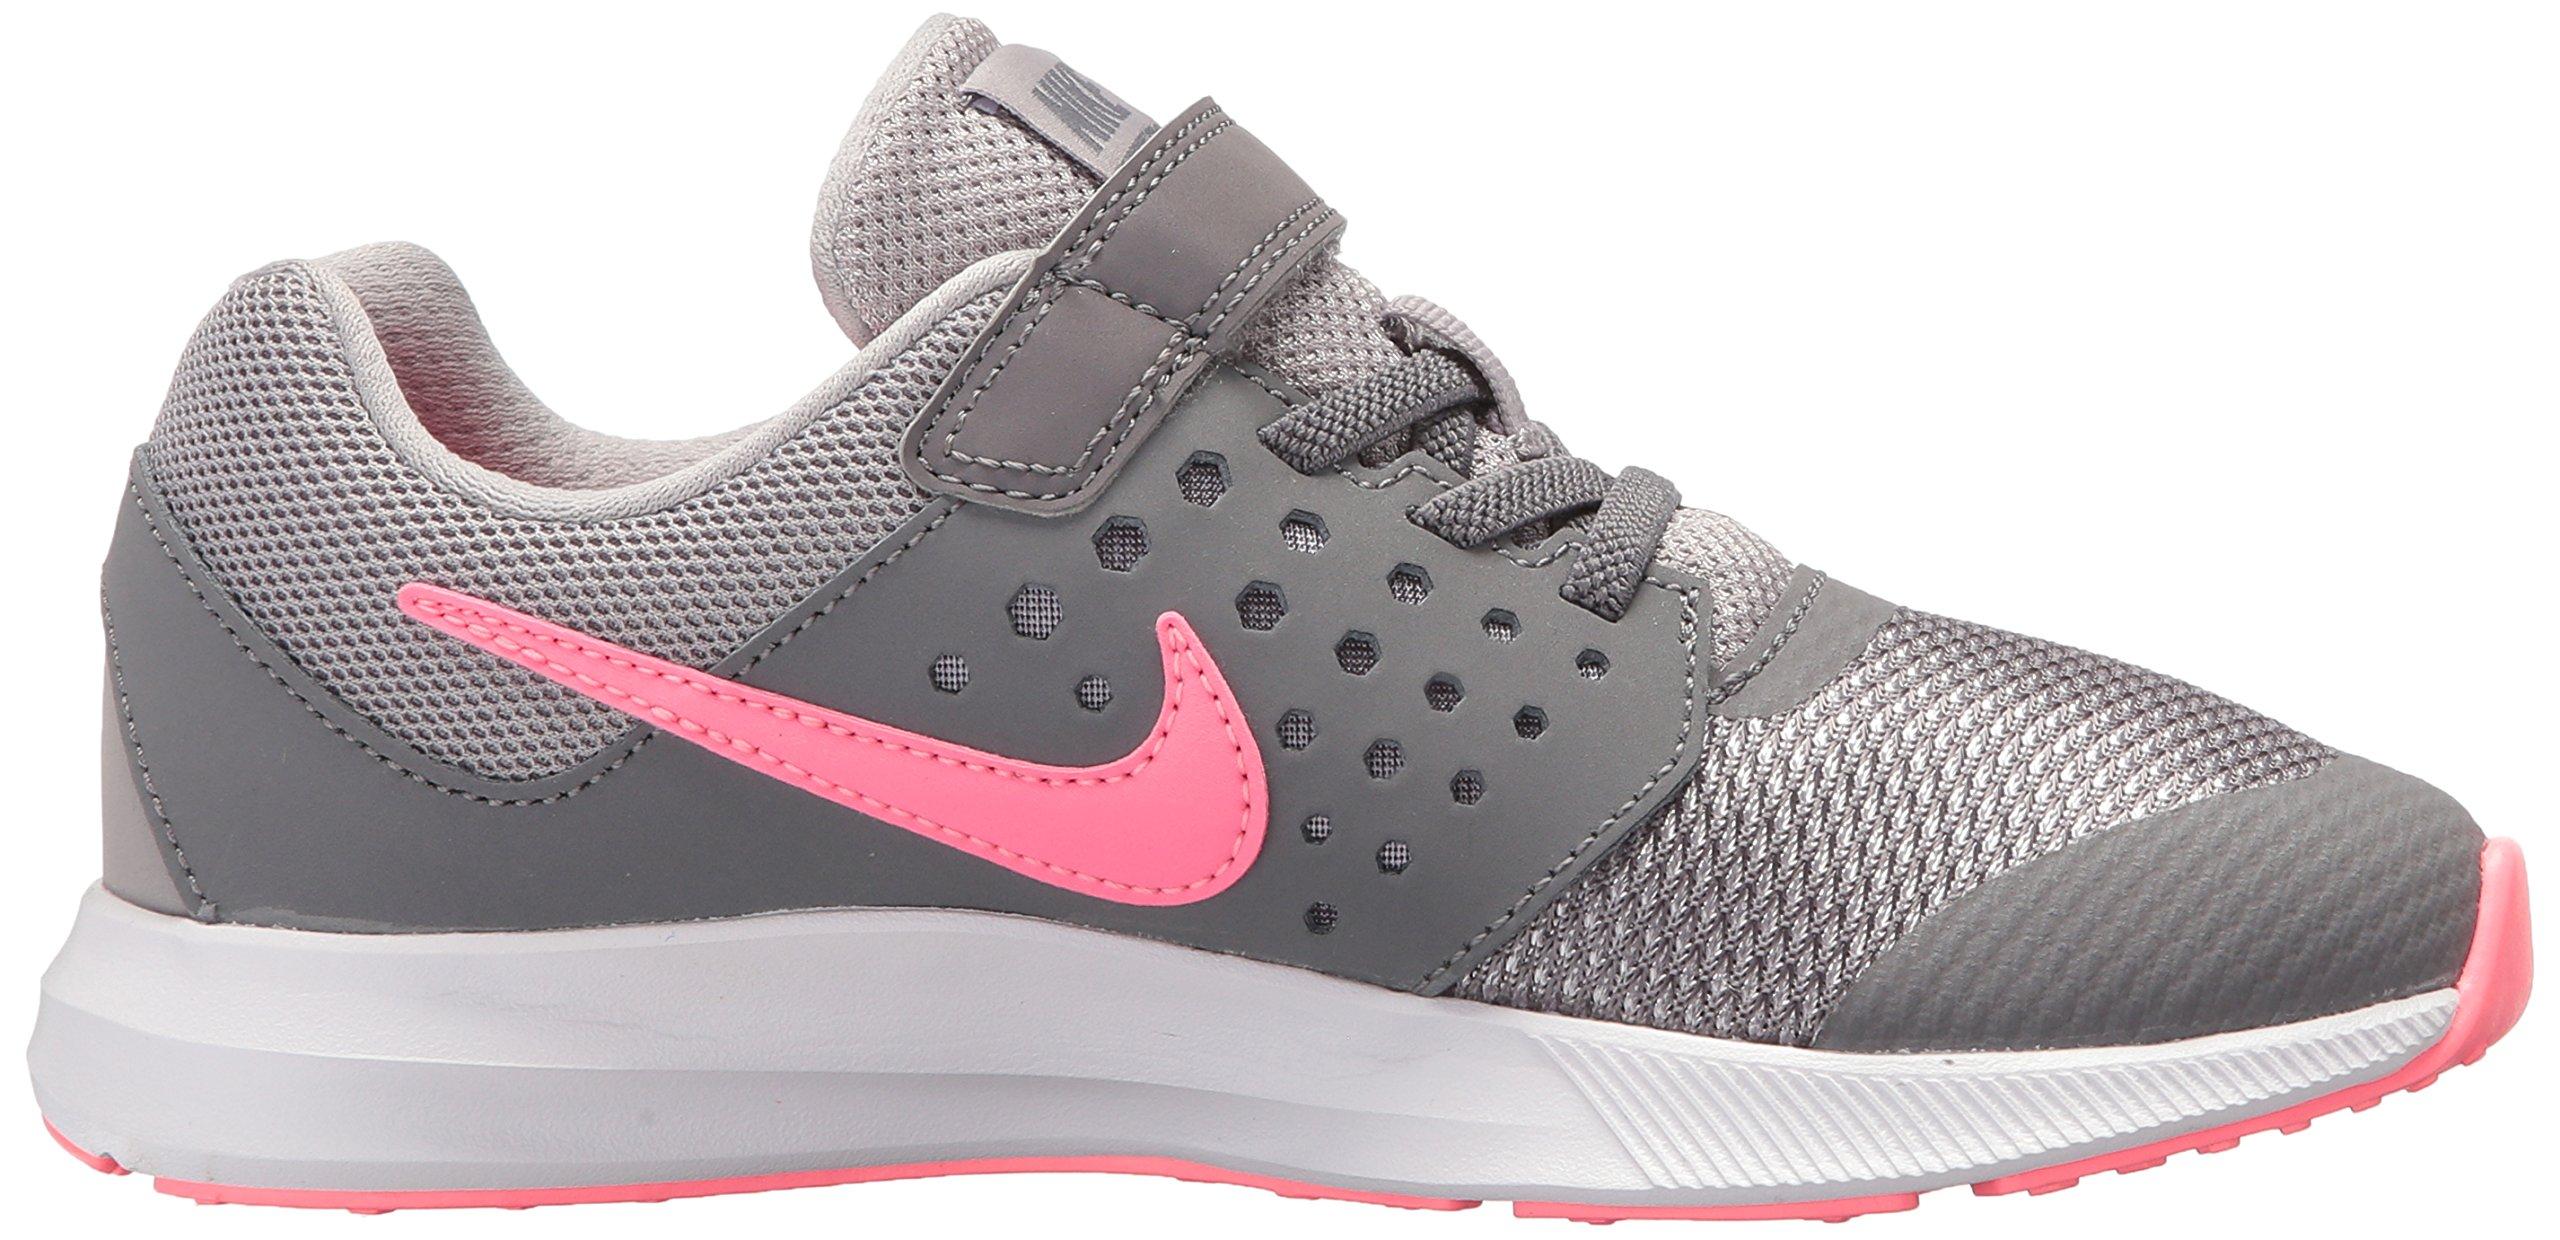 Nike Girls' Downshifter 7 (PSV) Running Shoe, Gunsmoke/Sunset Pulse-Atmosphere Grey, 2 M US Little Kid by Nike (Image #7)